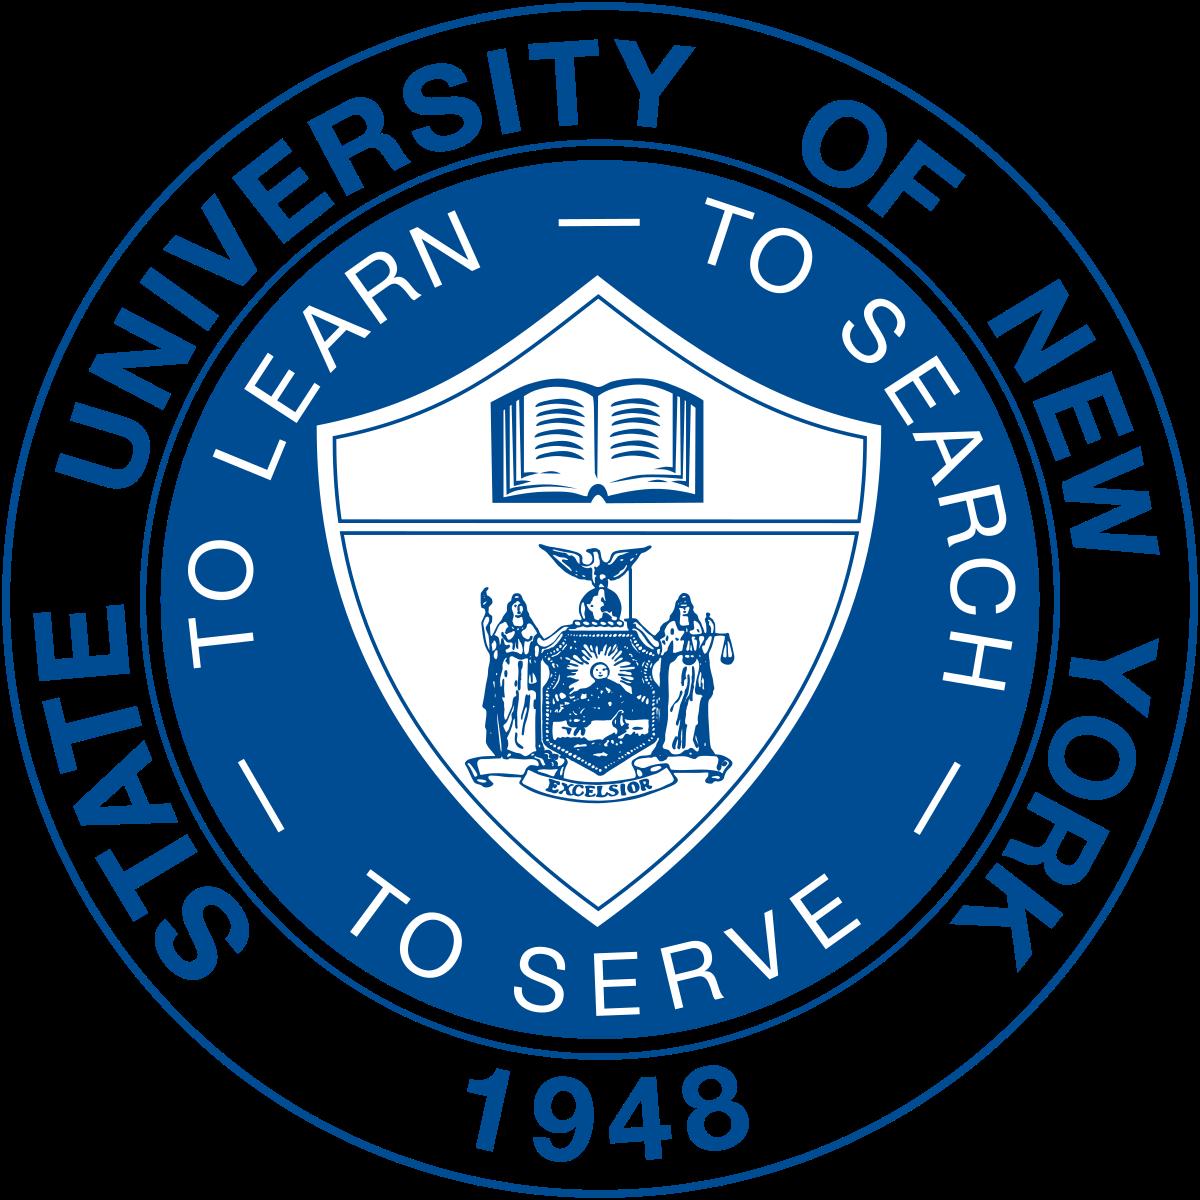 State University of New York.